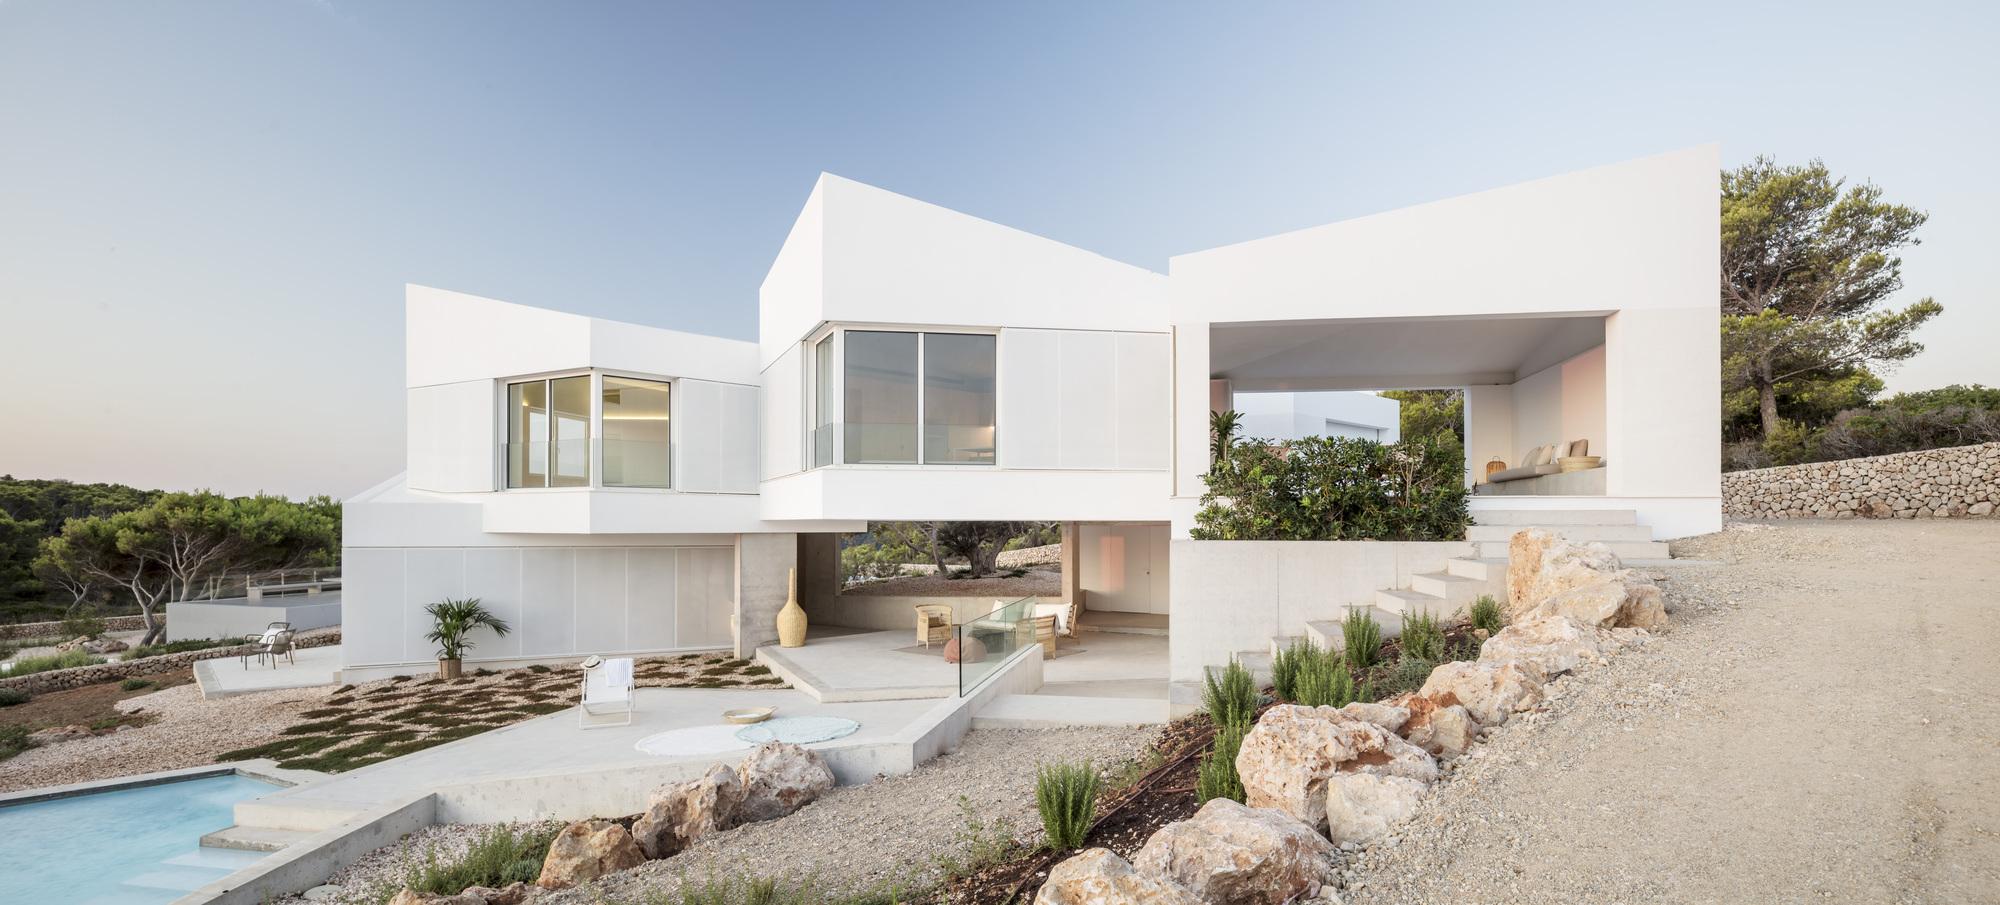 Bridge House / NOMO STUDIO